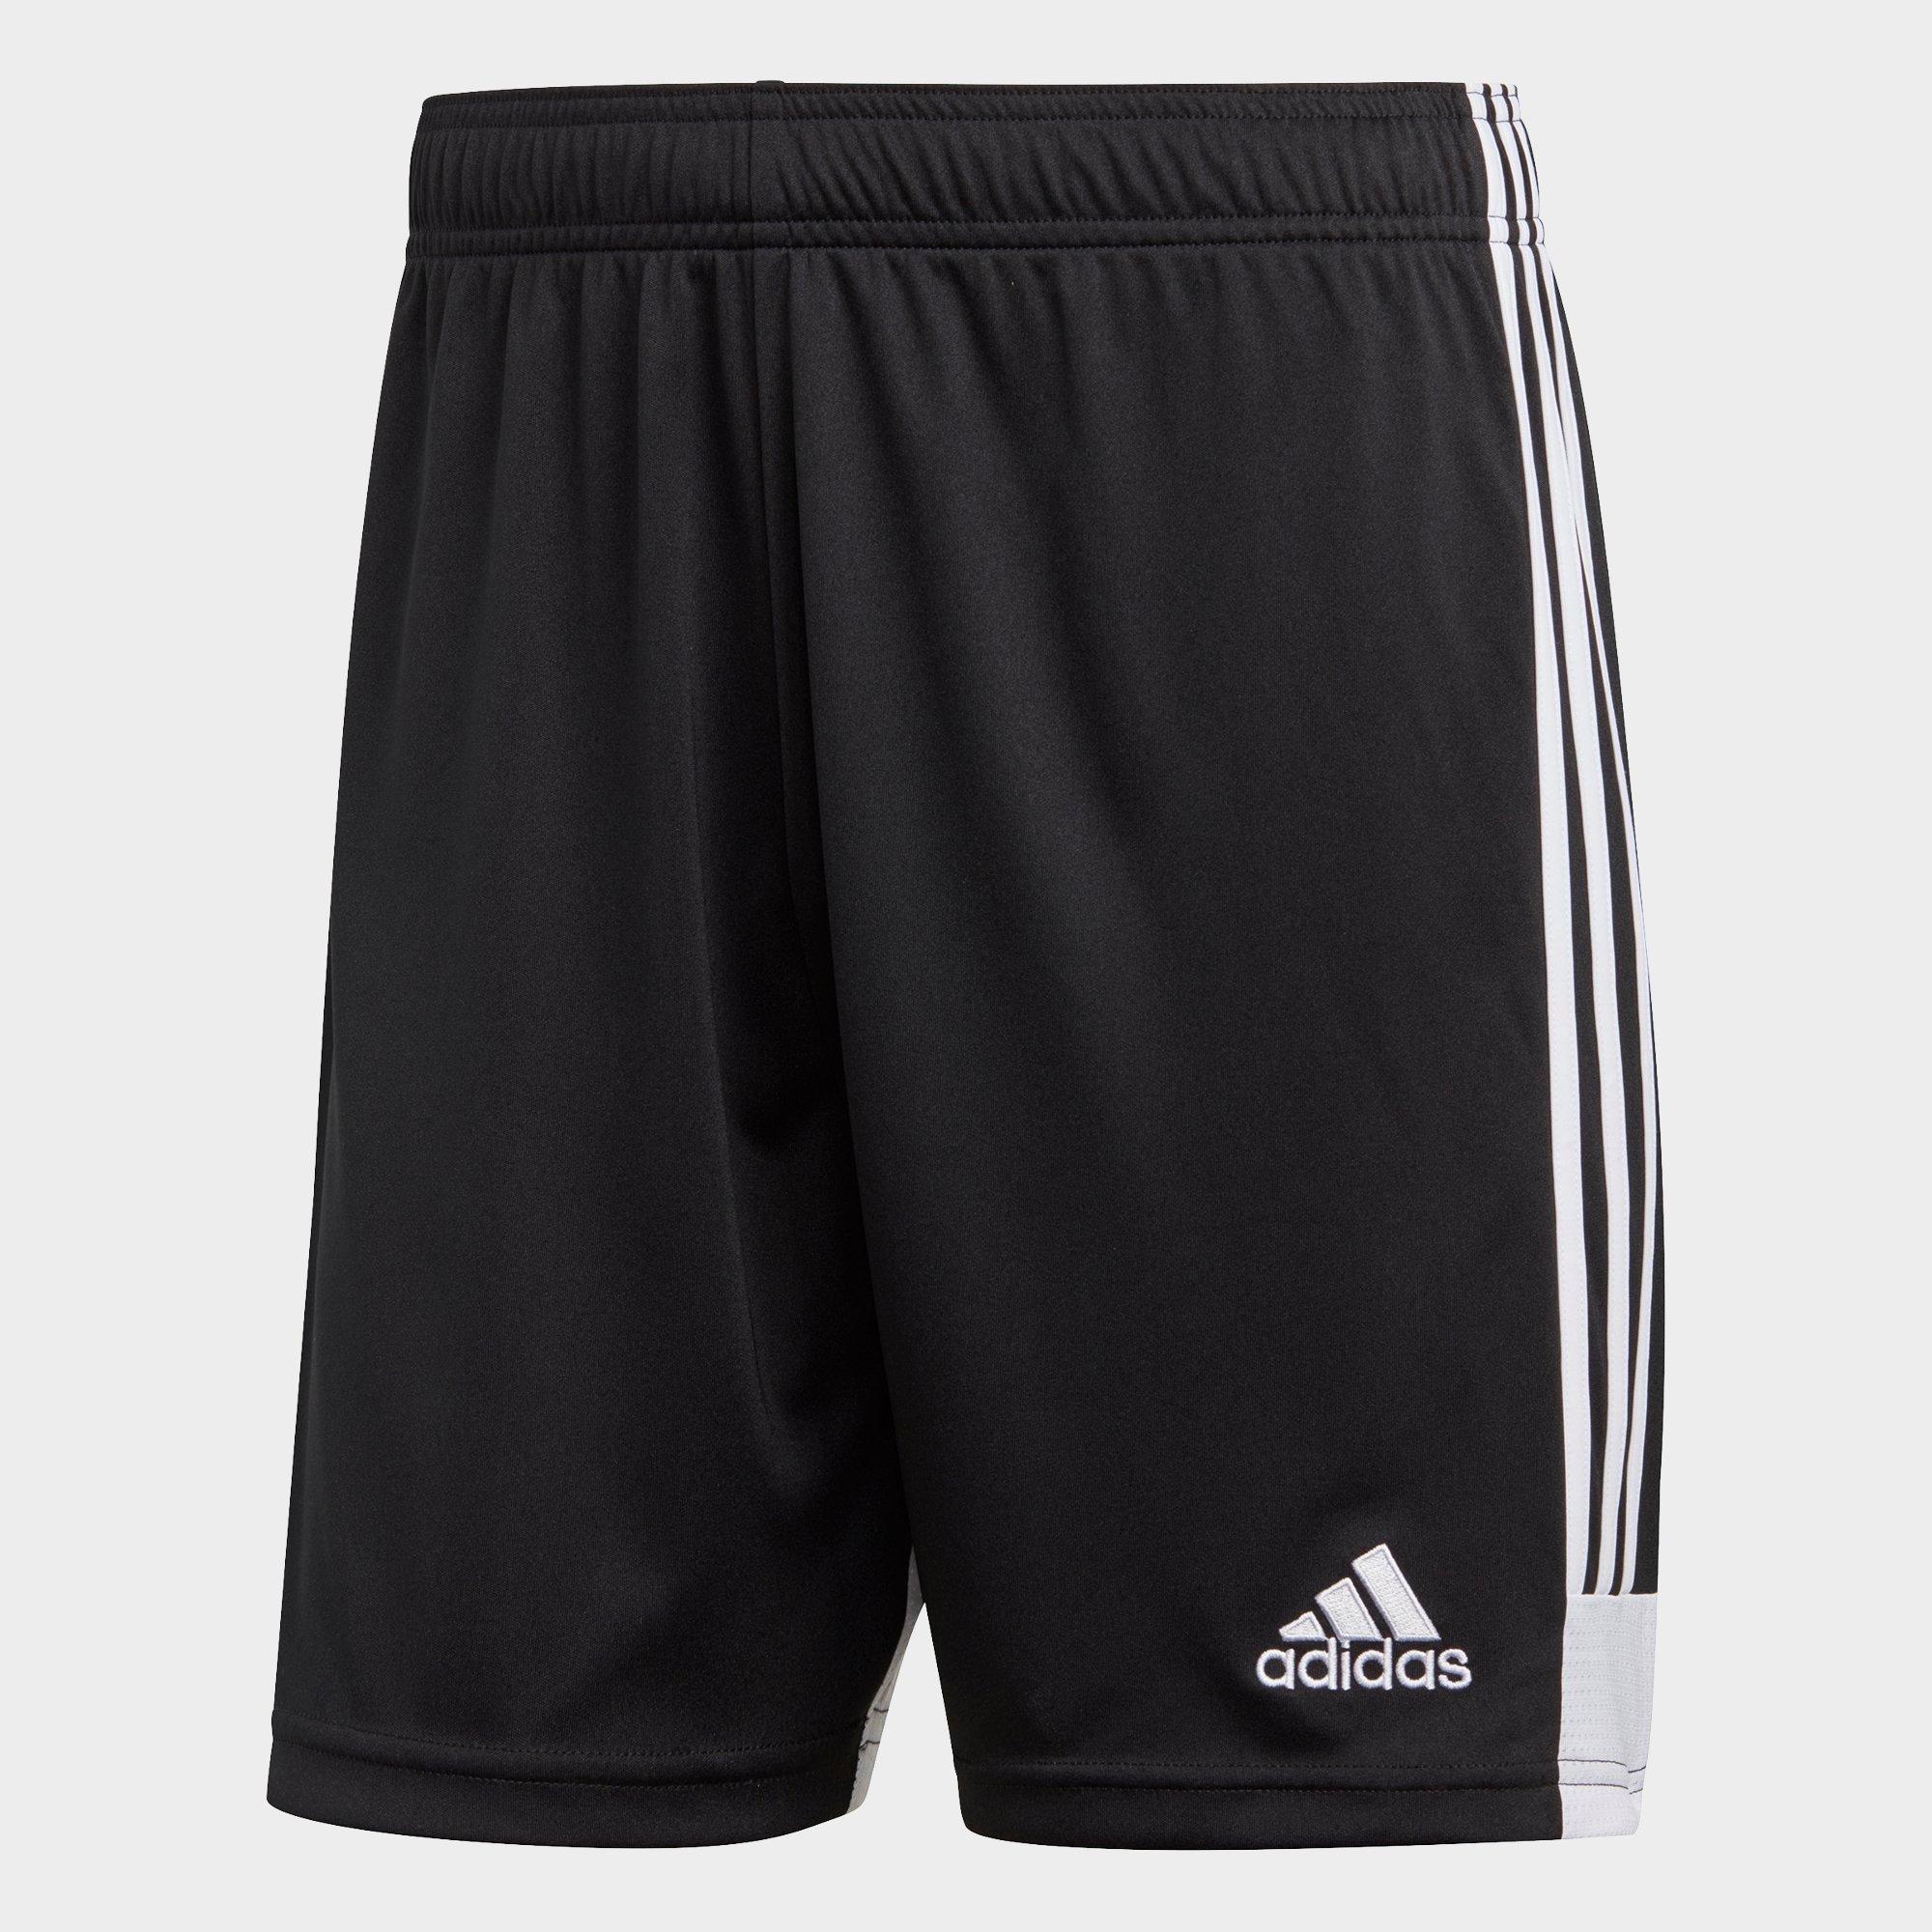 adidas training shorts